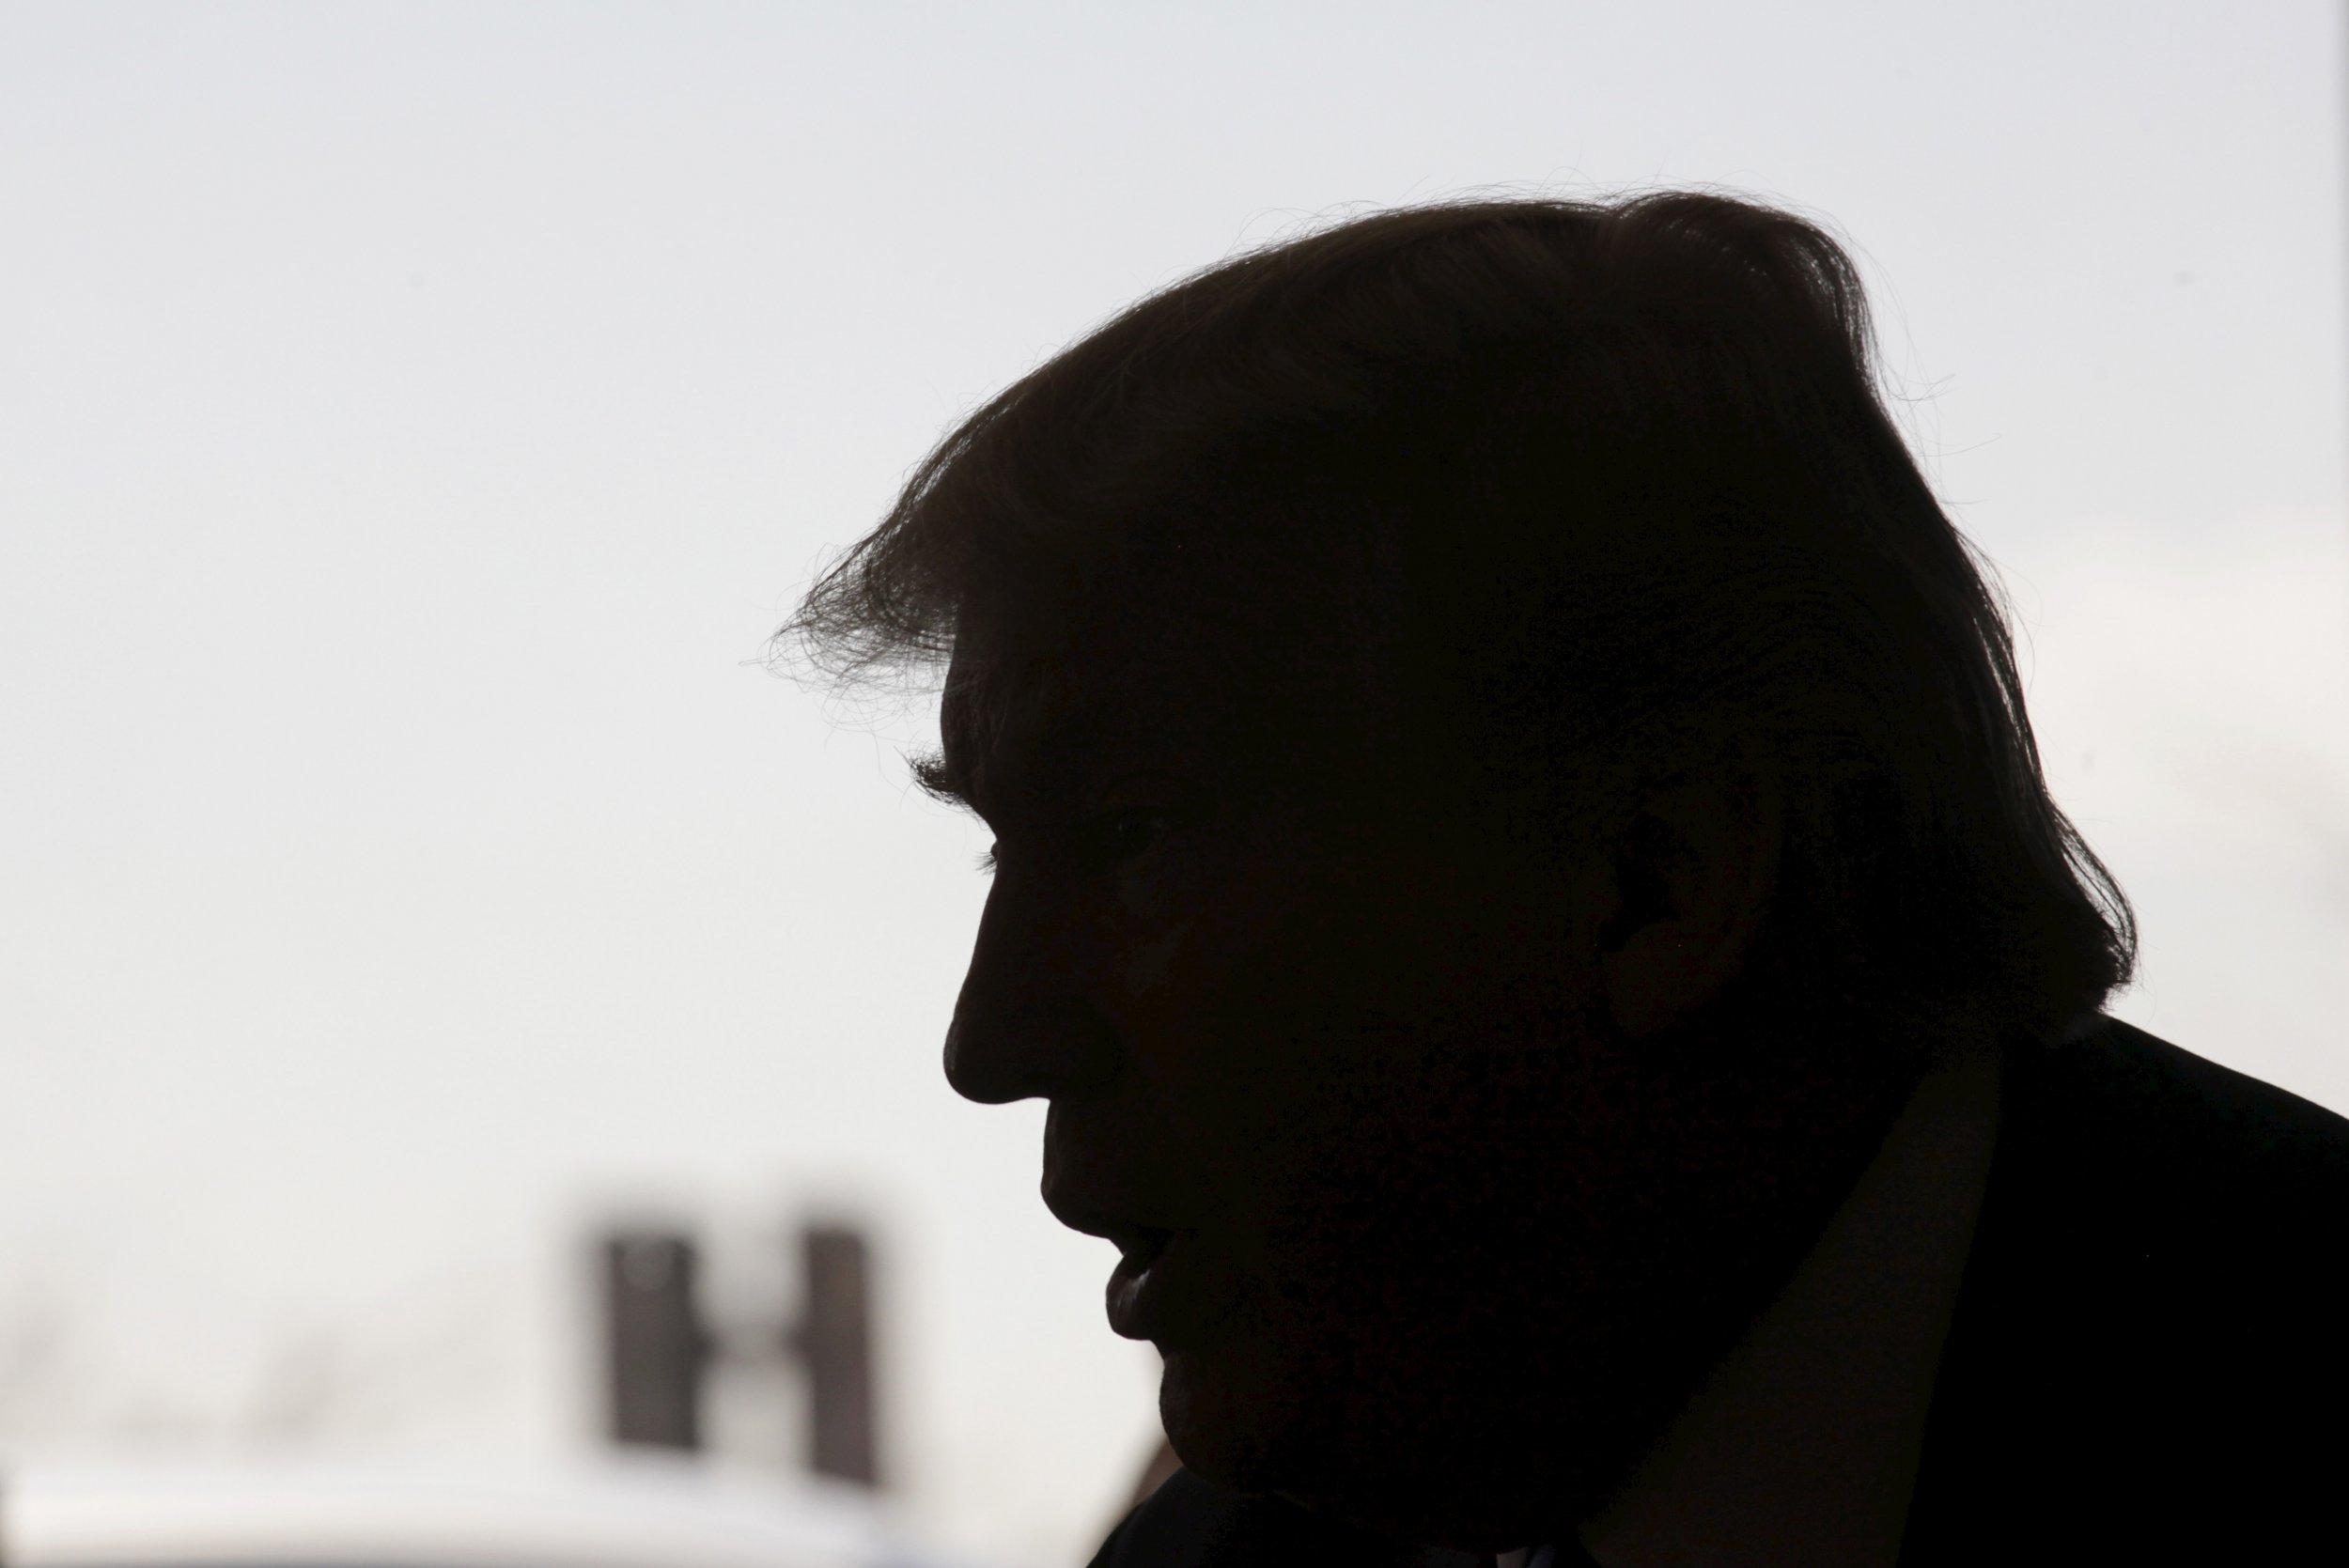 04_08_Trump_Presidency_01